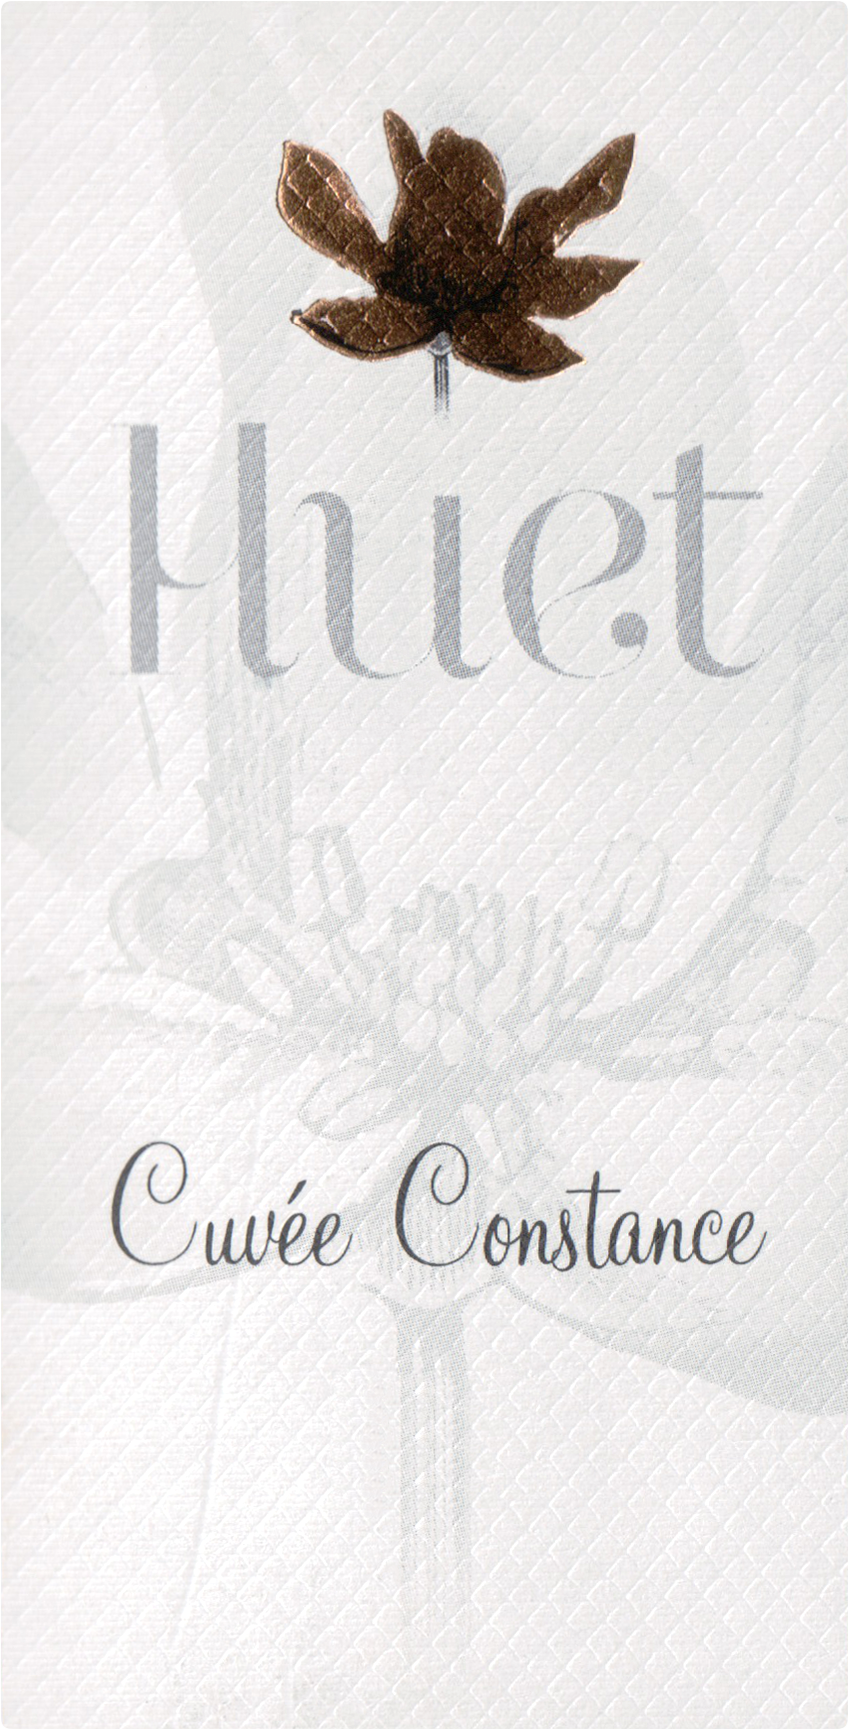 Huet Vouvray Cuvee Constance 2016